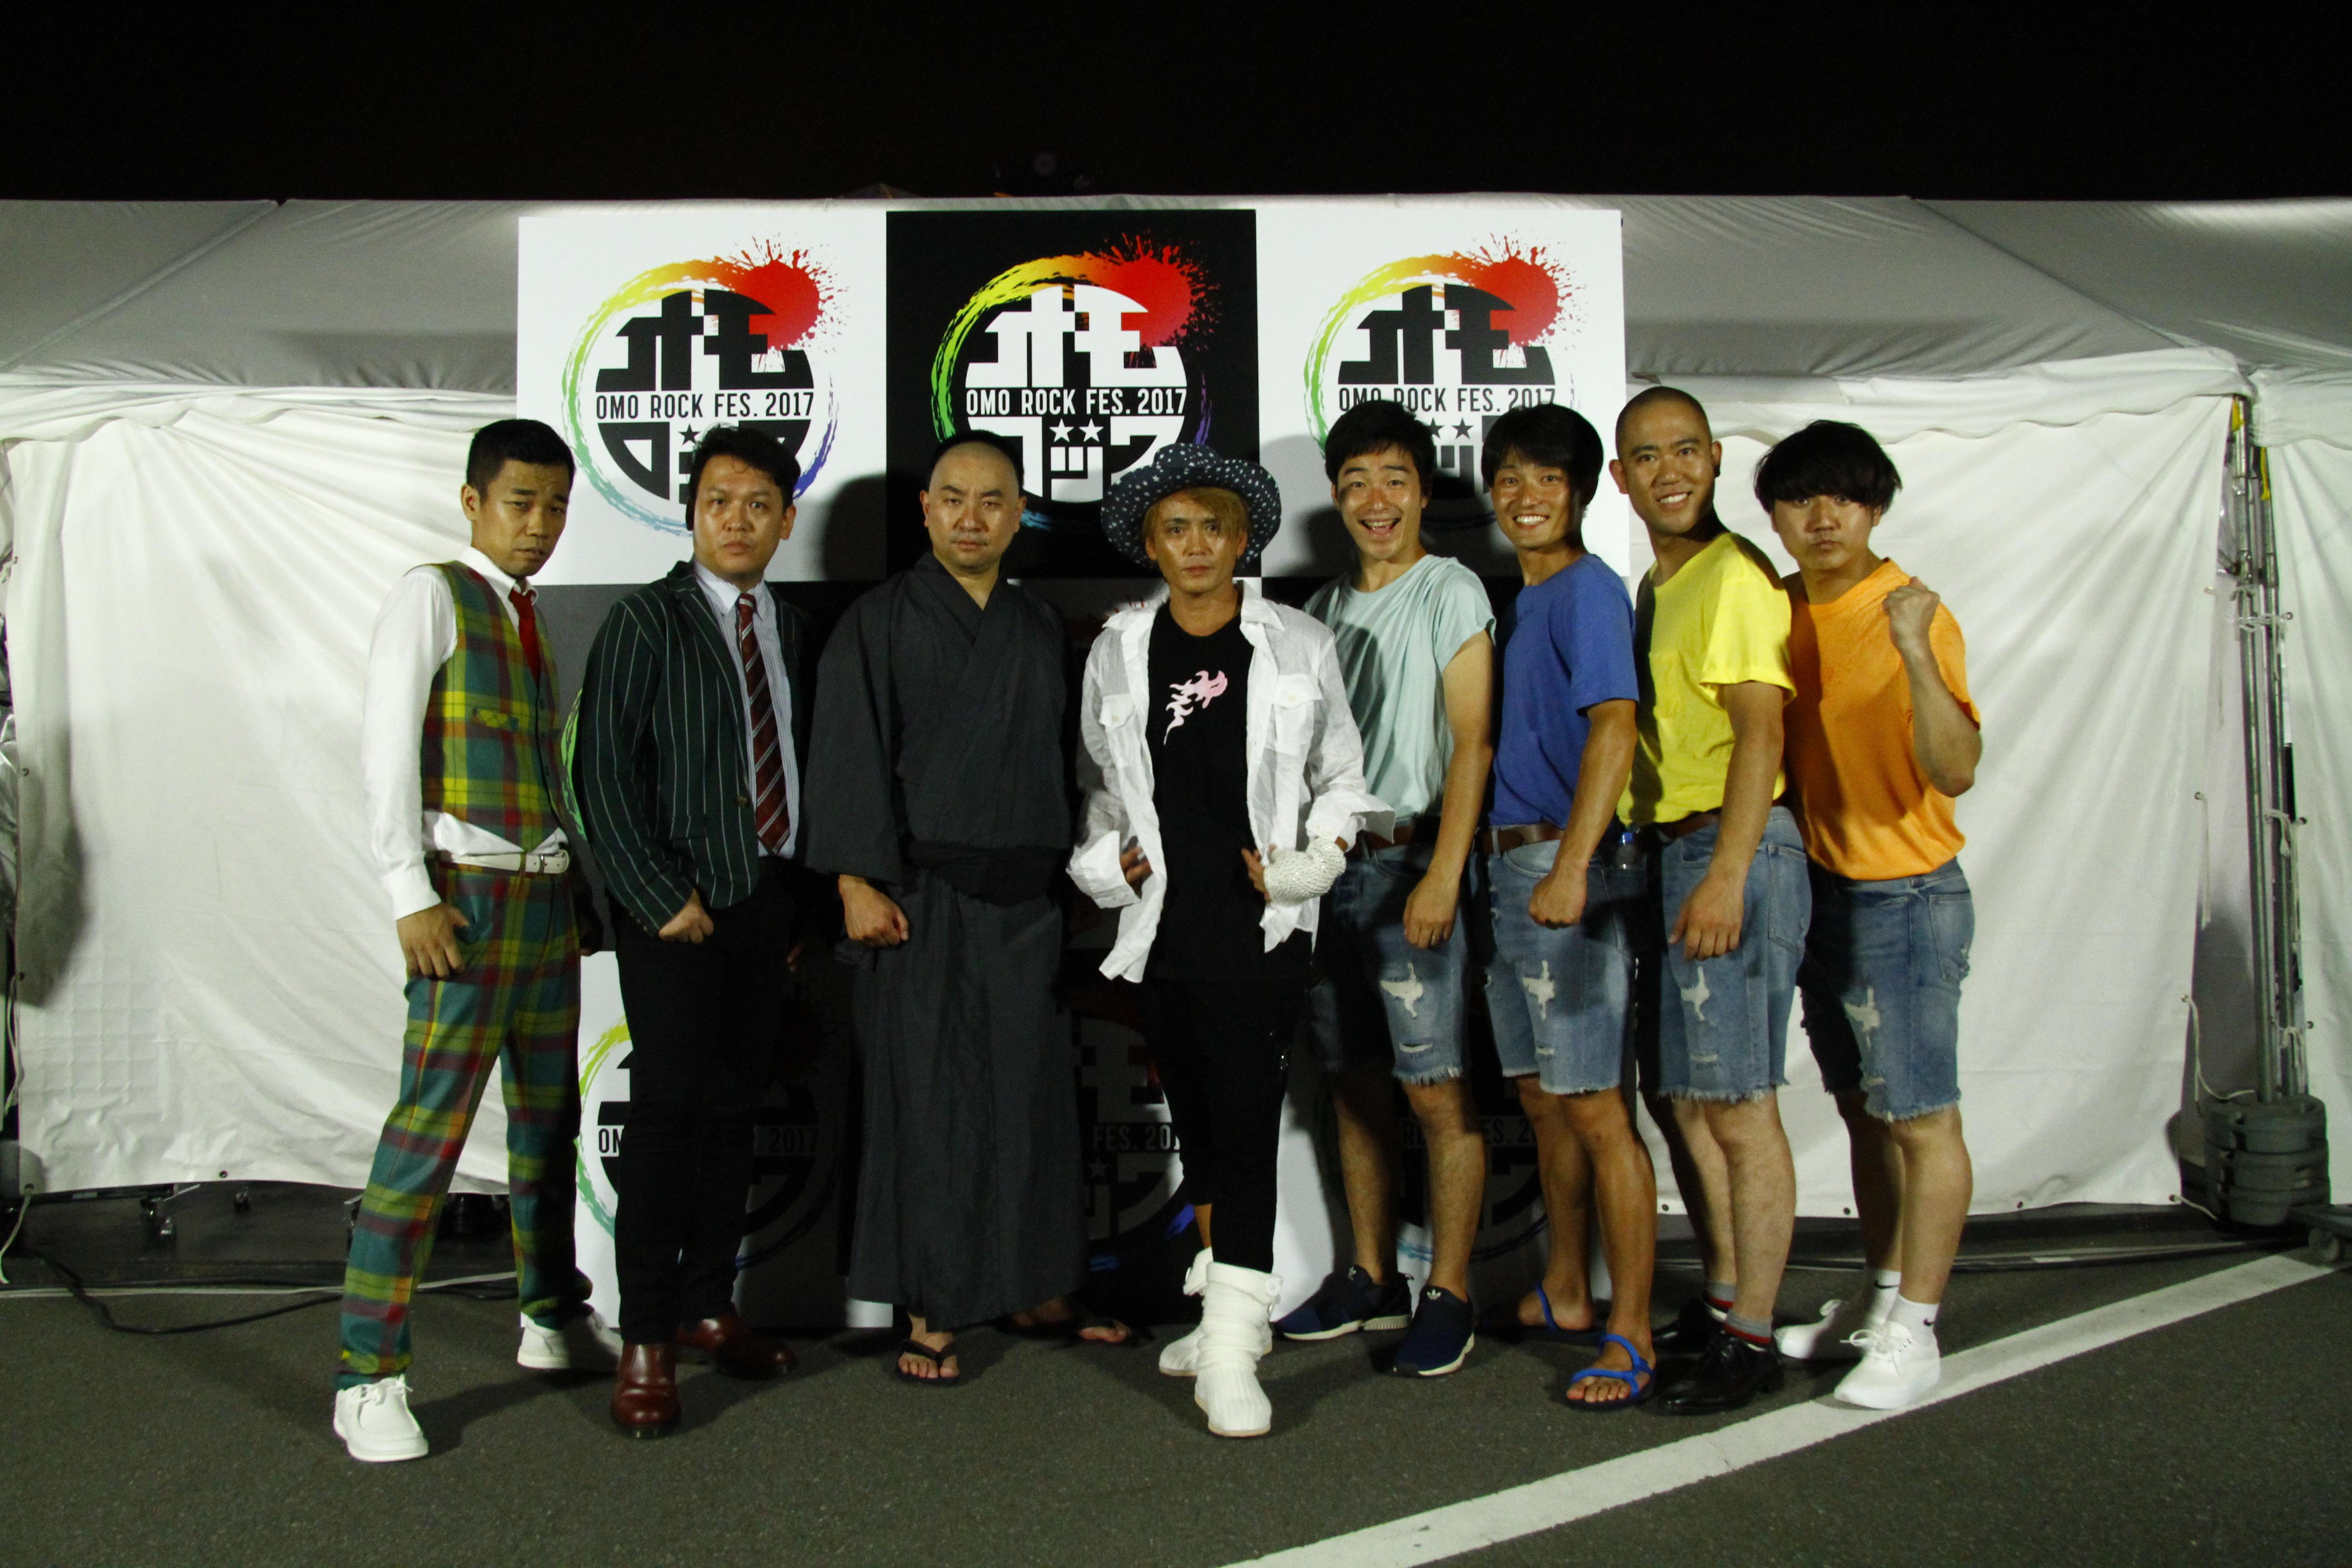 http://news.yoshimoto.co.jp/20170807013522-f4638399b1077a9aa49537972b8c207fe9694a50.jpg